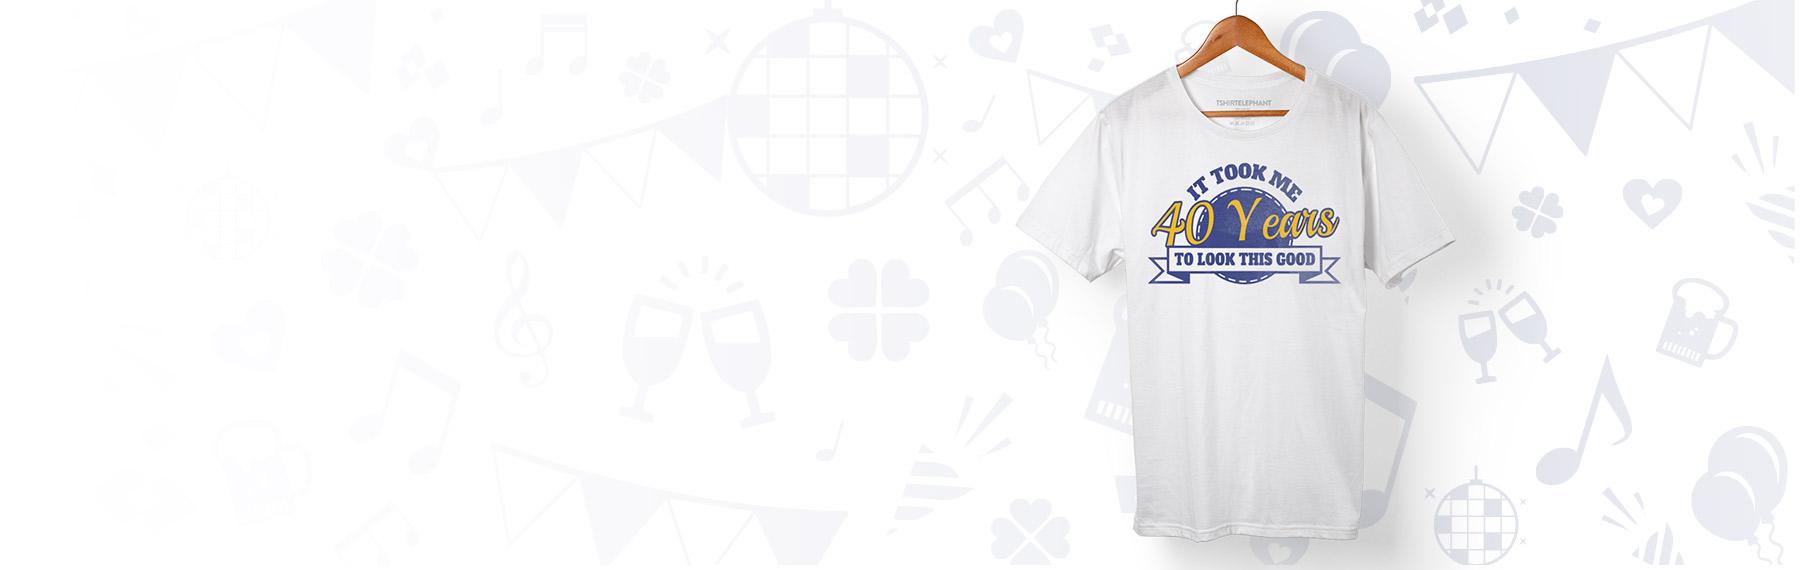 Design Birthday T Shirts